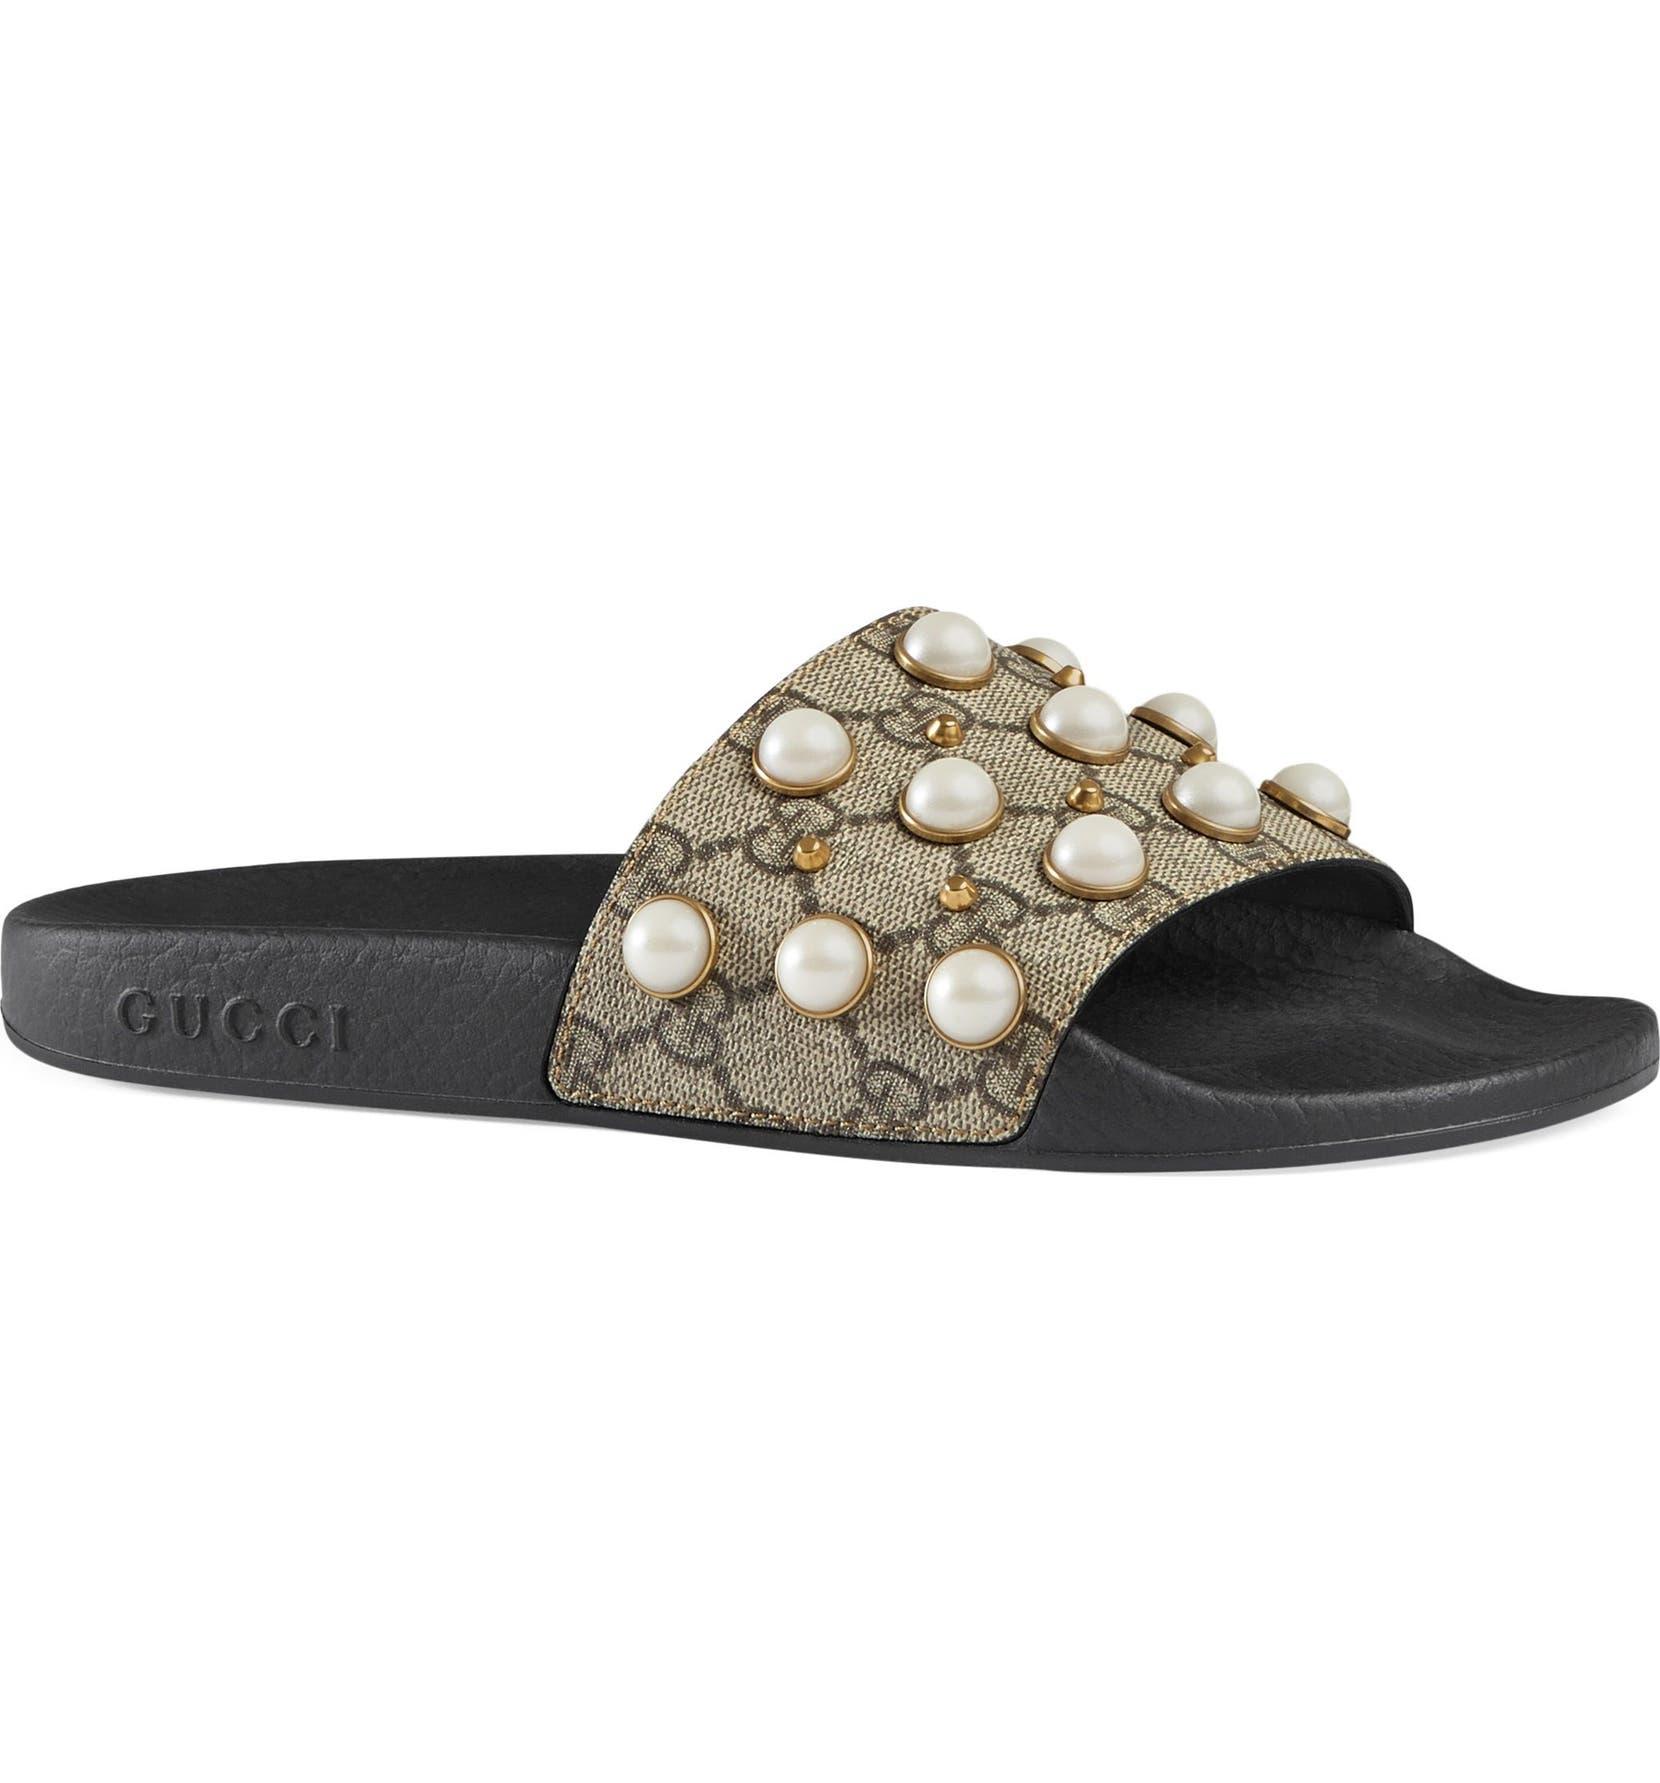 62ba761a8 Gucci Pursuit Imitation Pearl Embellished Slide Sandal (Women ...